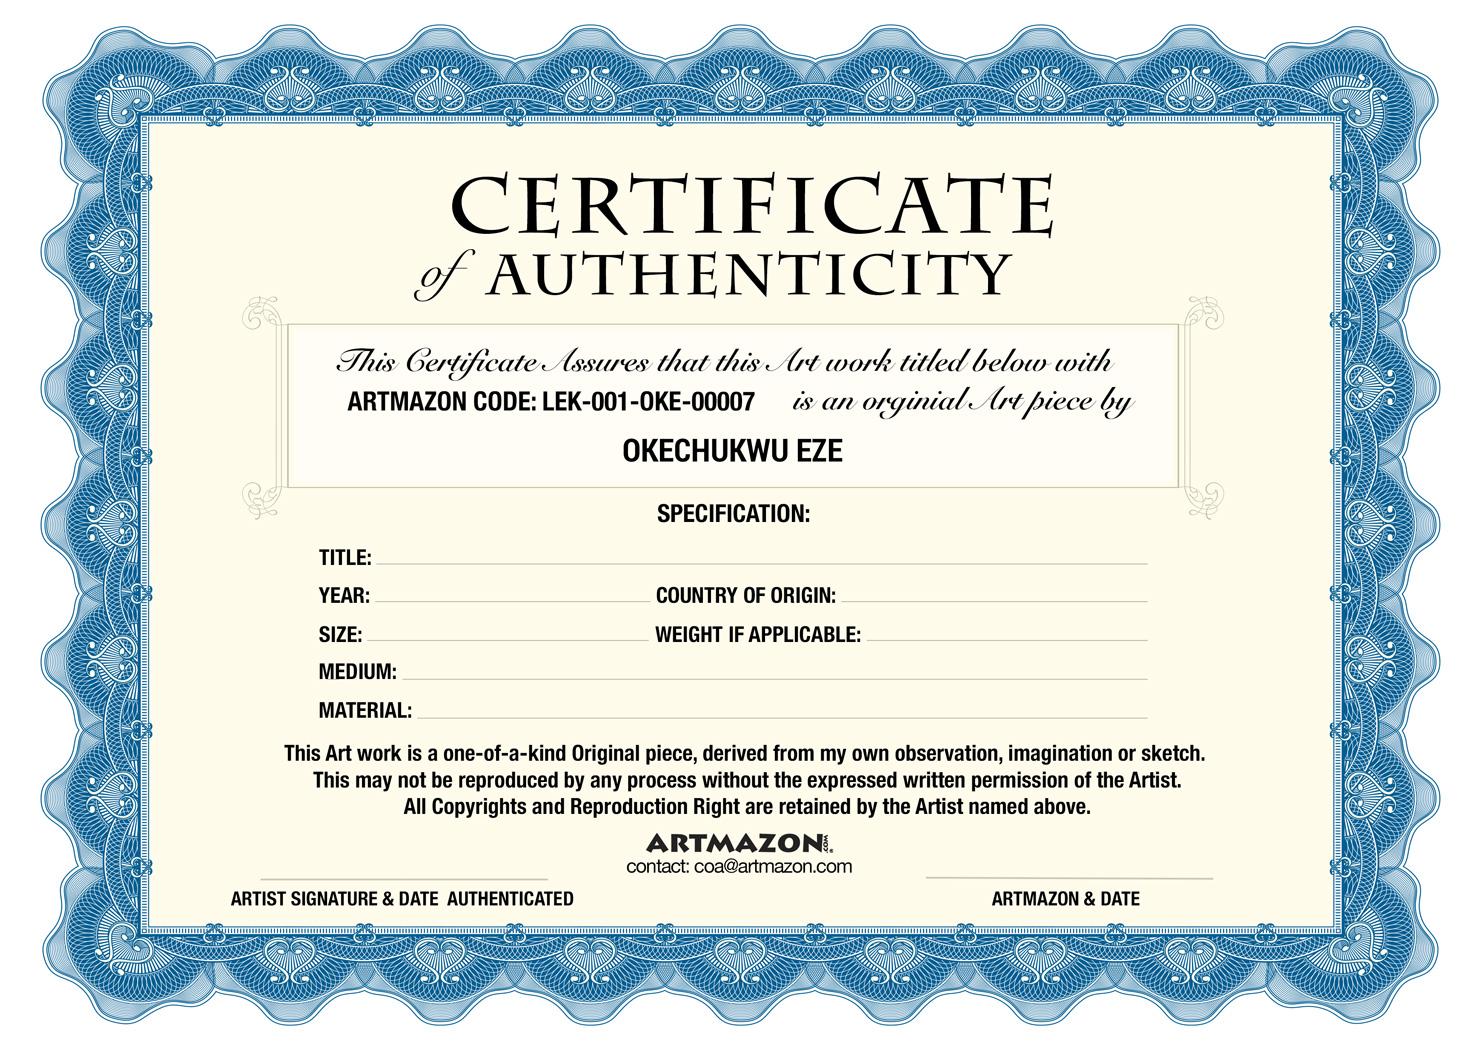 COA (Certificate of Authenticity)